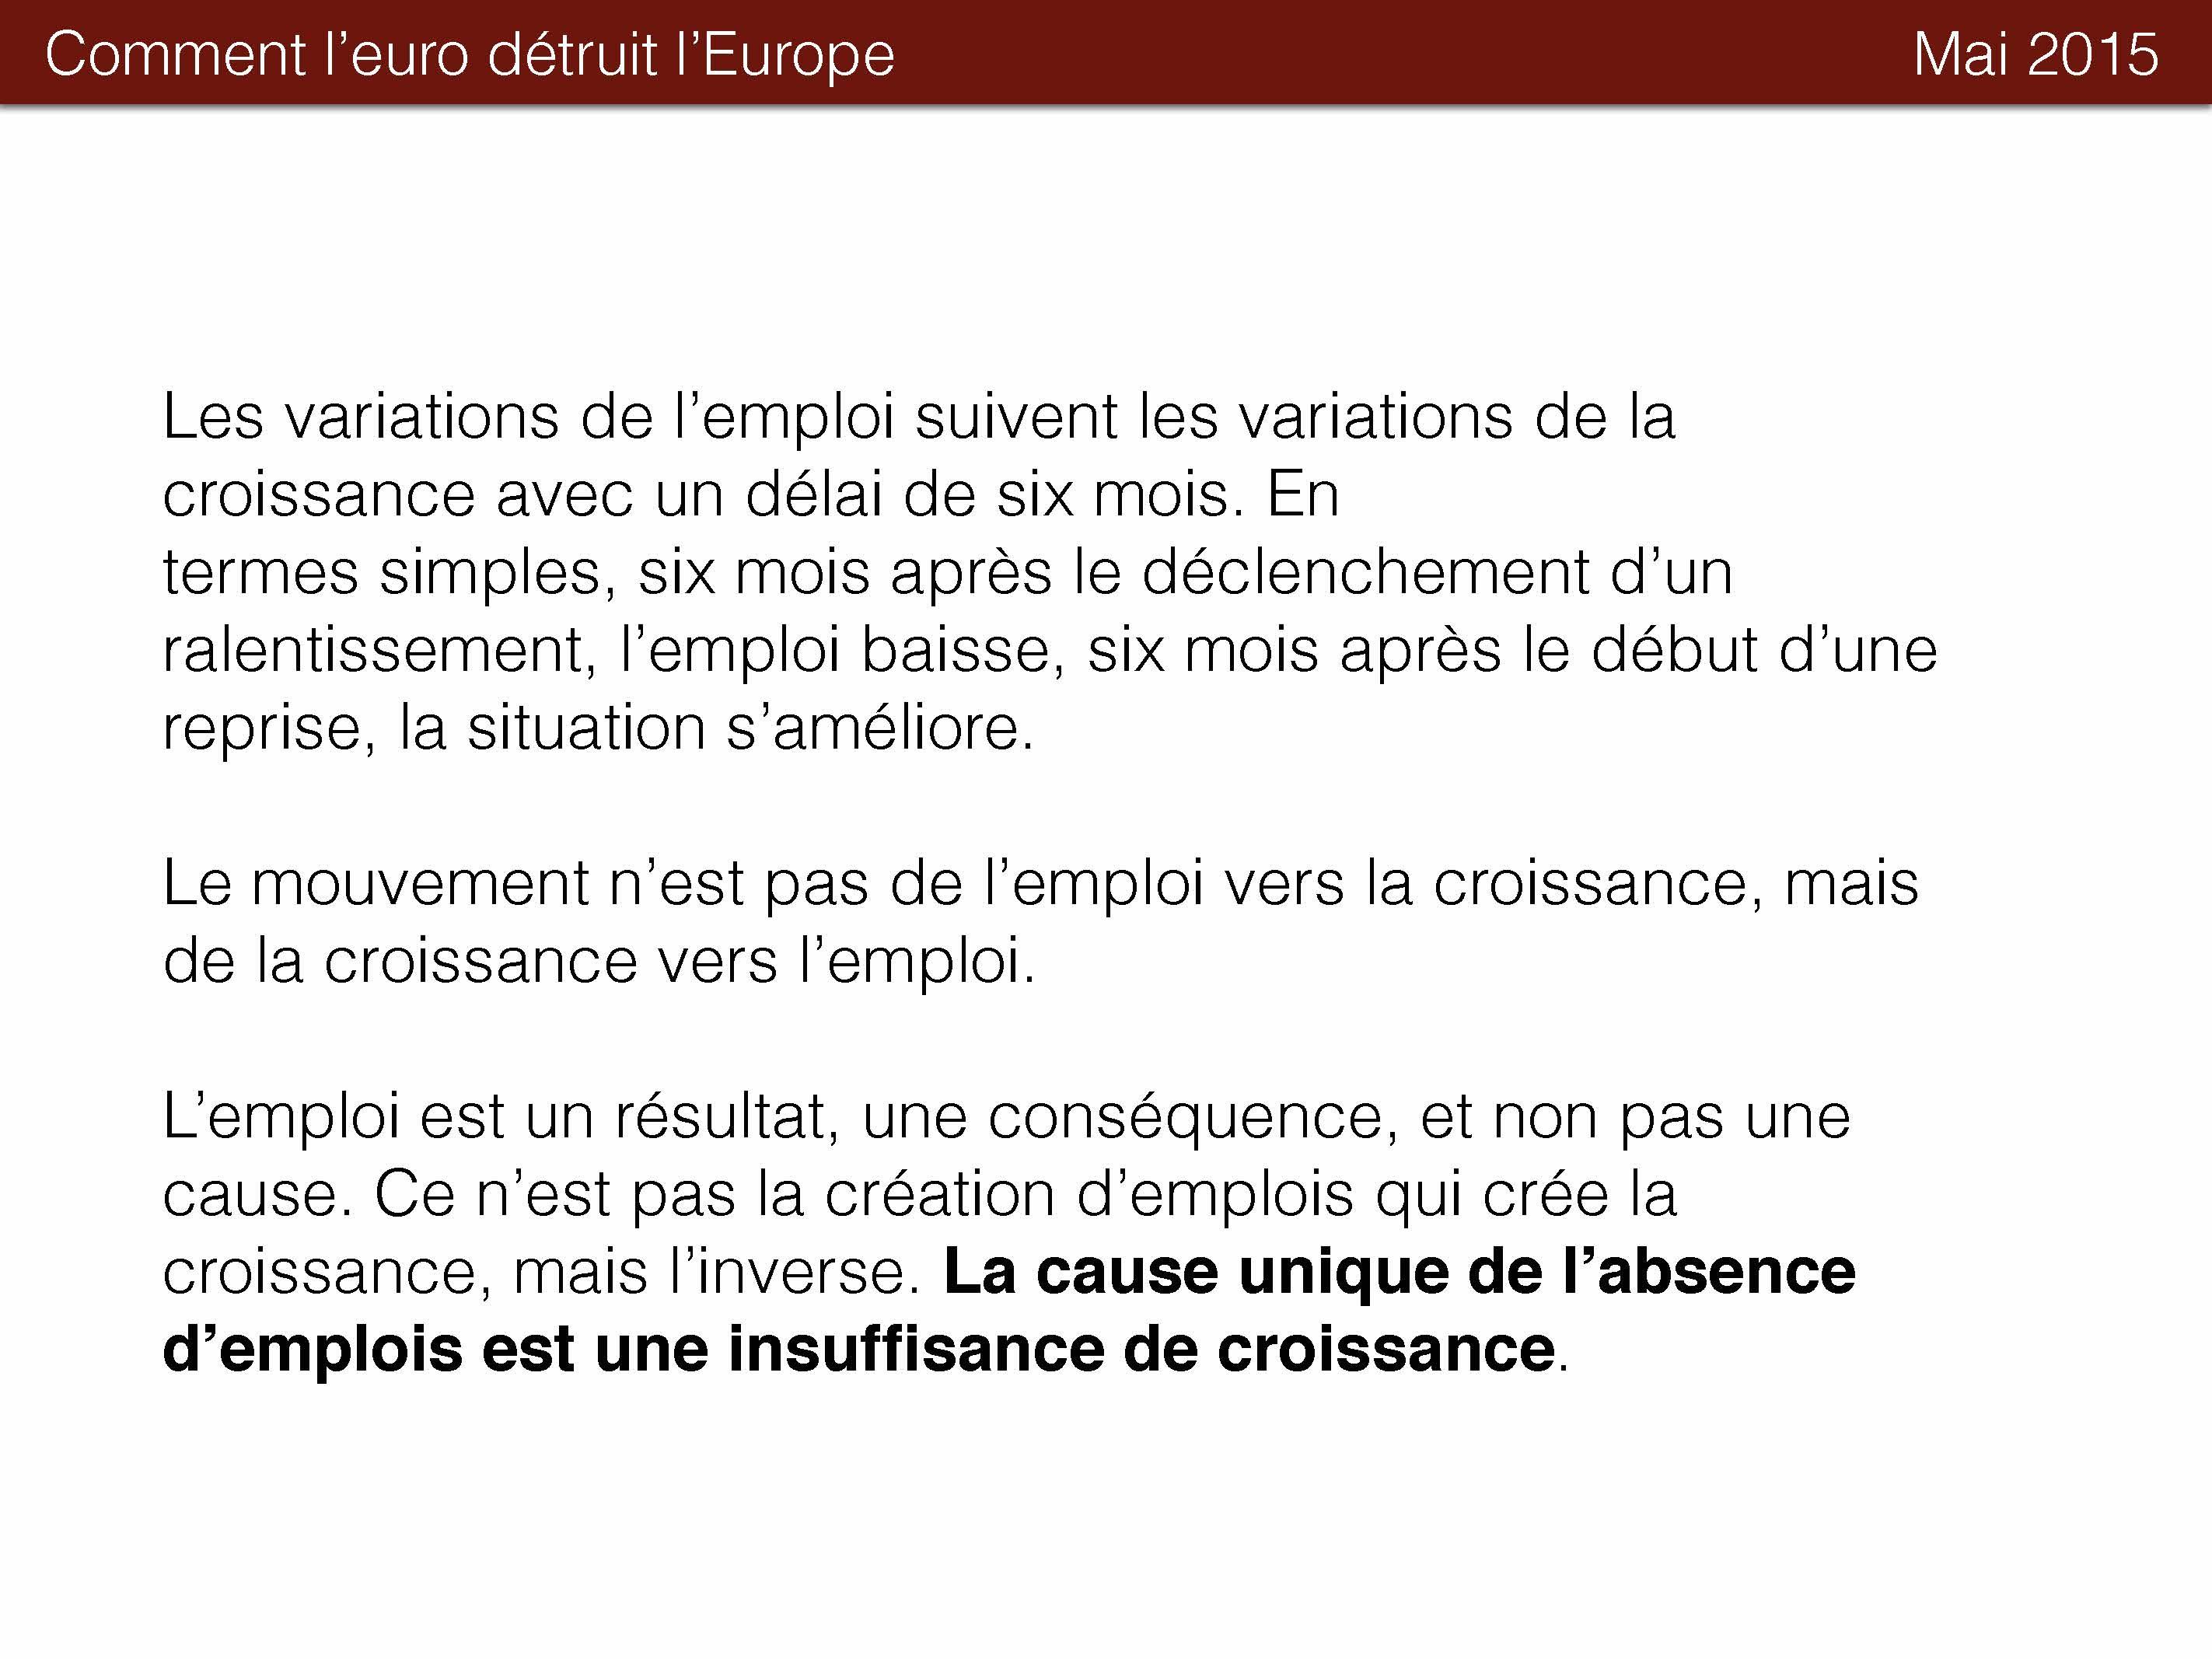 EUro_Page_19